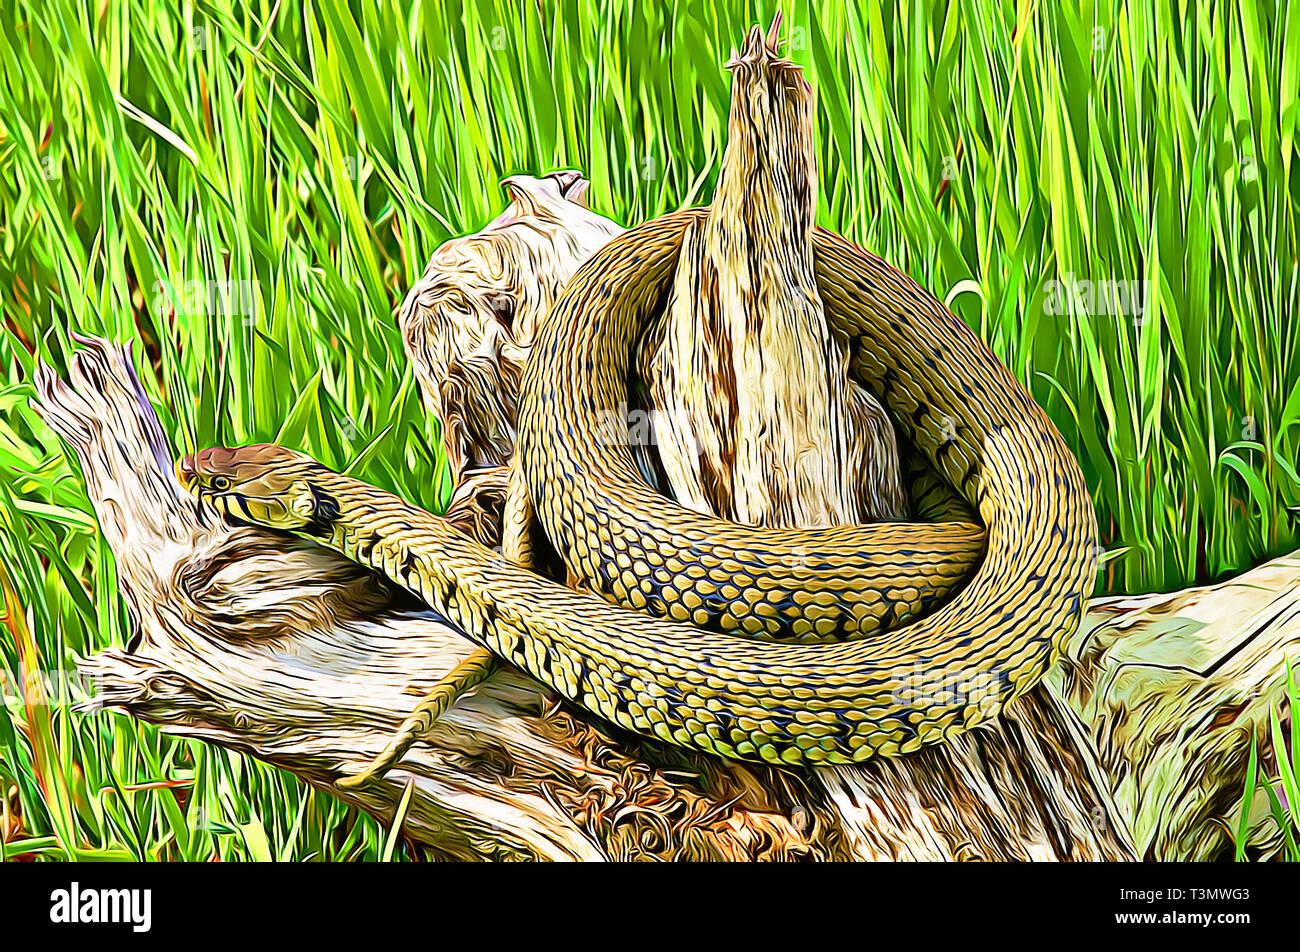 Grass Snake (Natrix Natrix)  Digital art filter - Stock Image